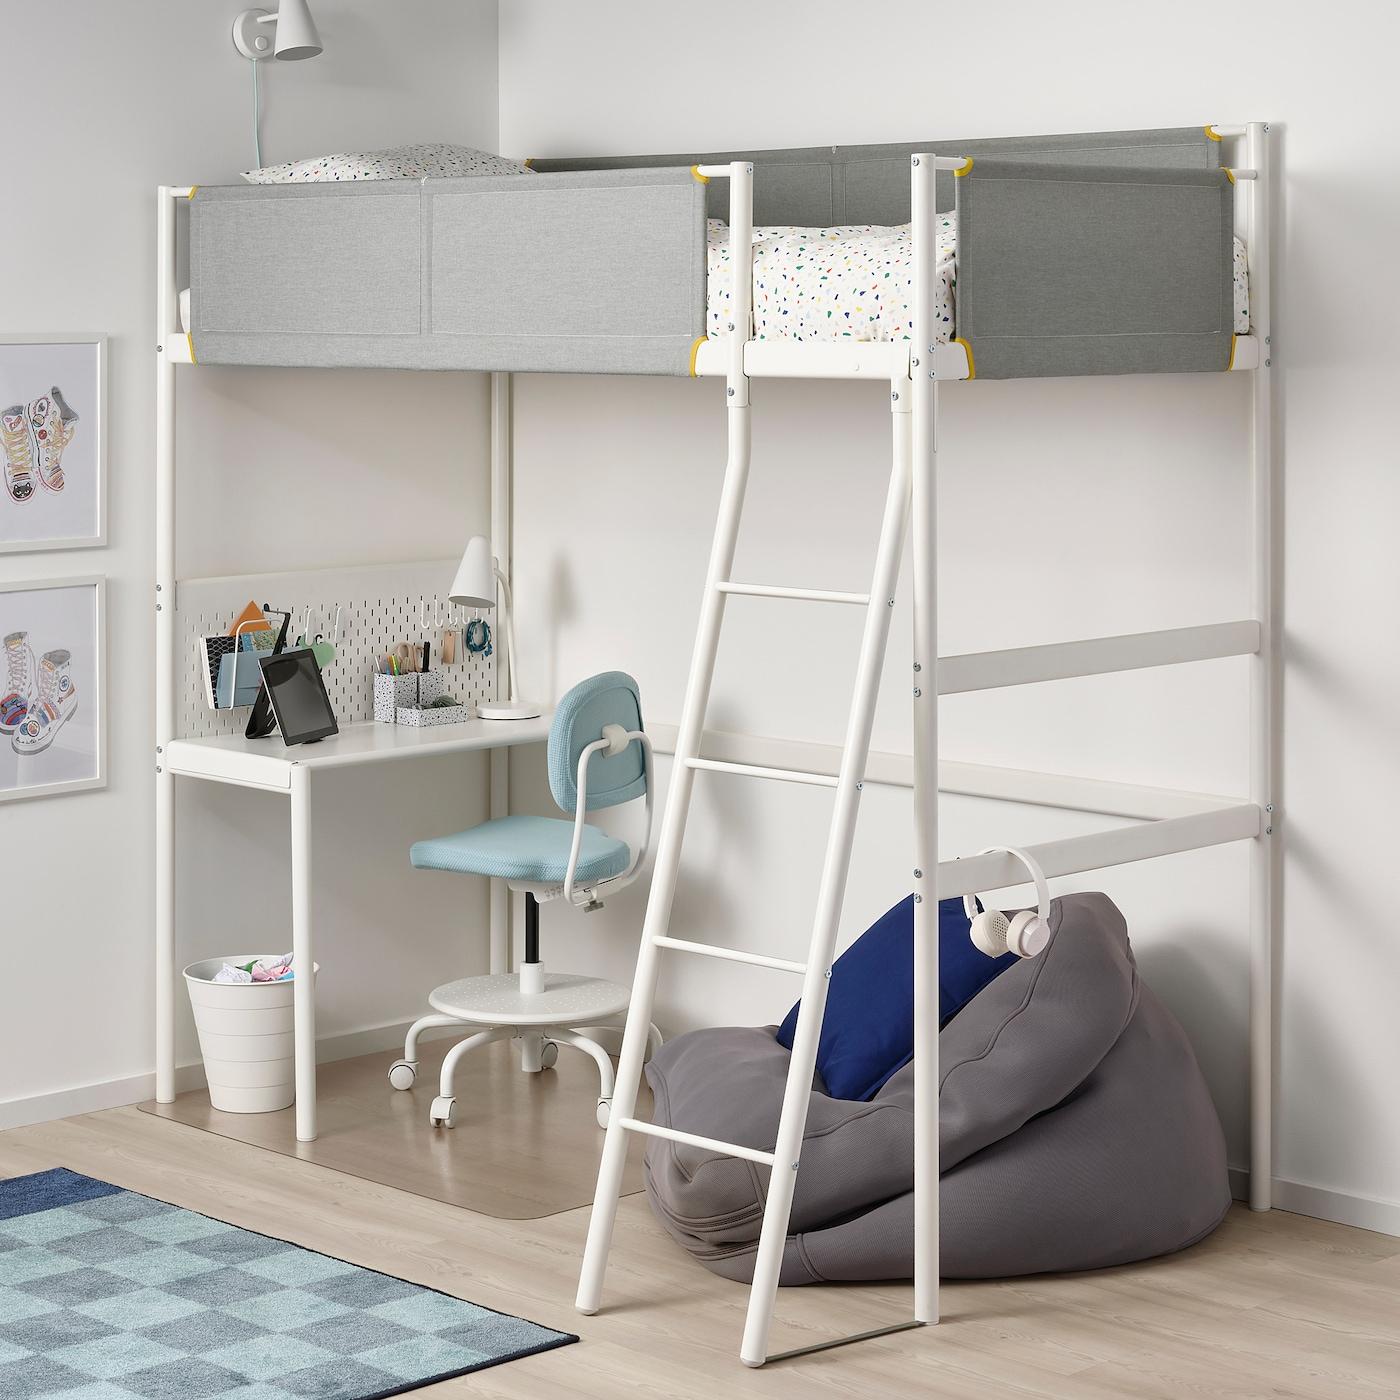 VITVAL 비트발 로프트침대프레임+책상상판, 화이트/라이트그레이, 90x200 cm